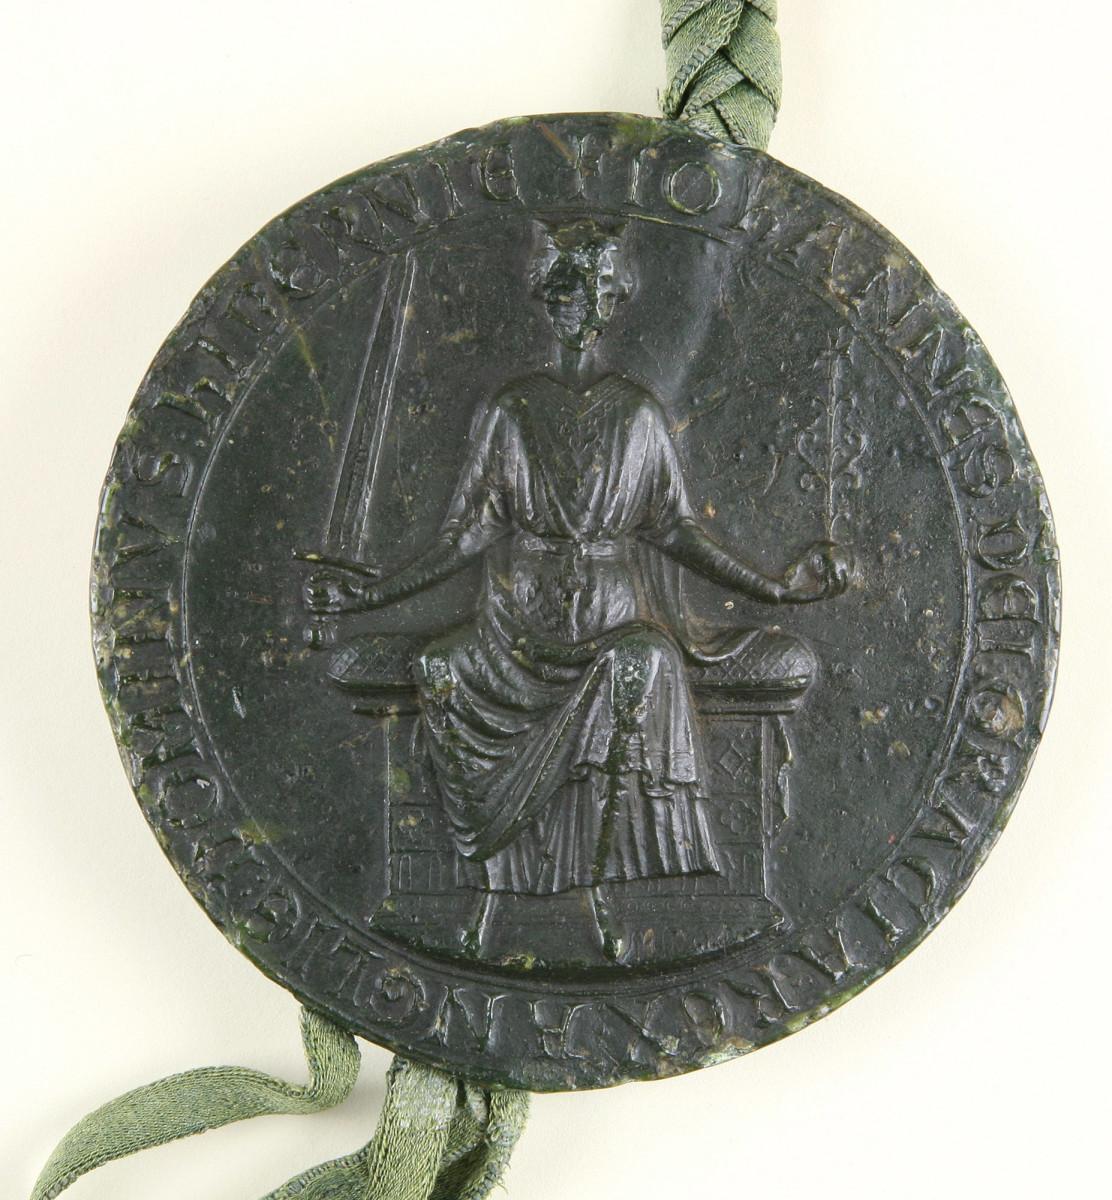 King John's Seal on Magna Carter 1215